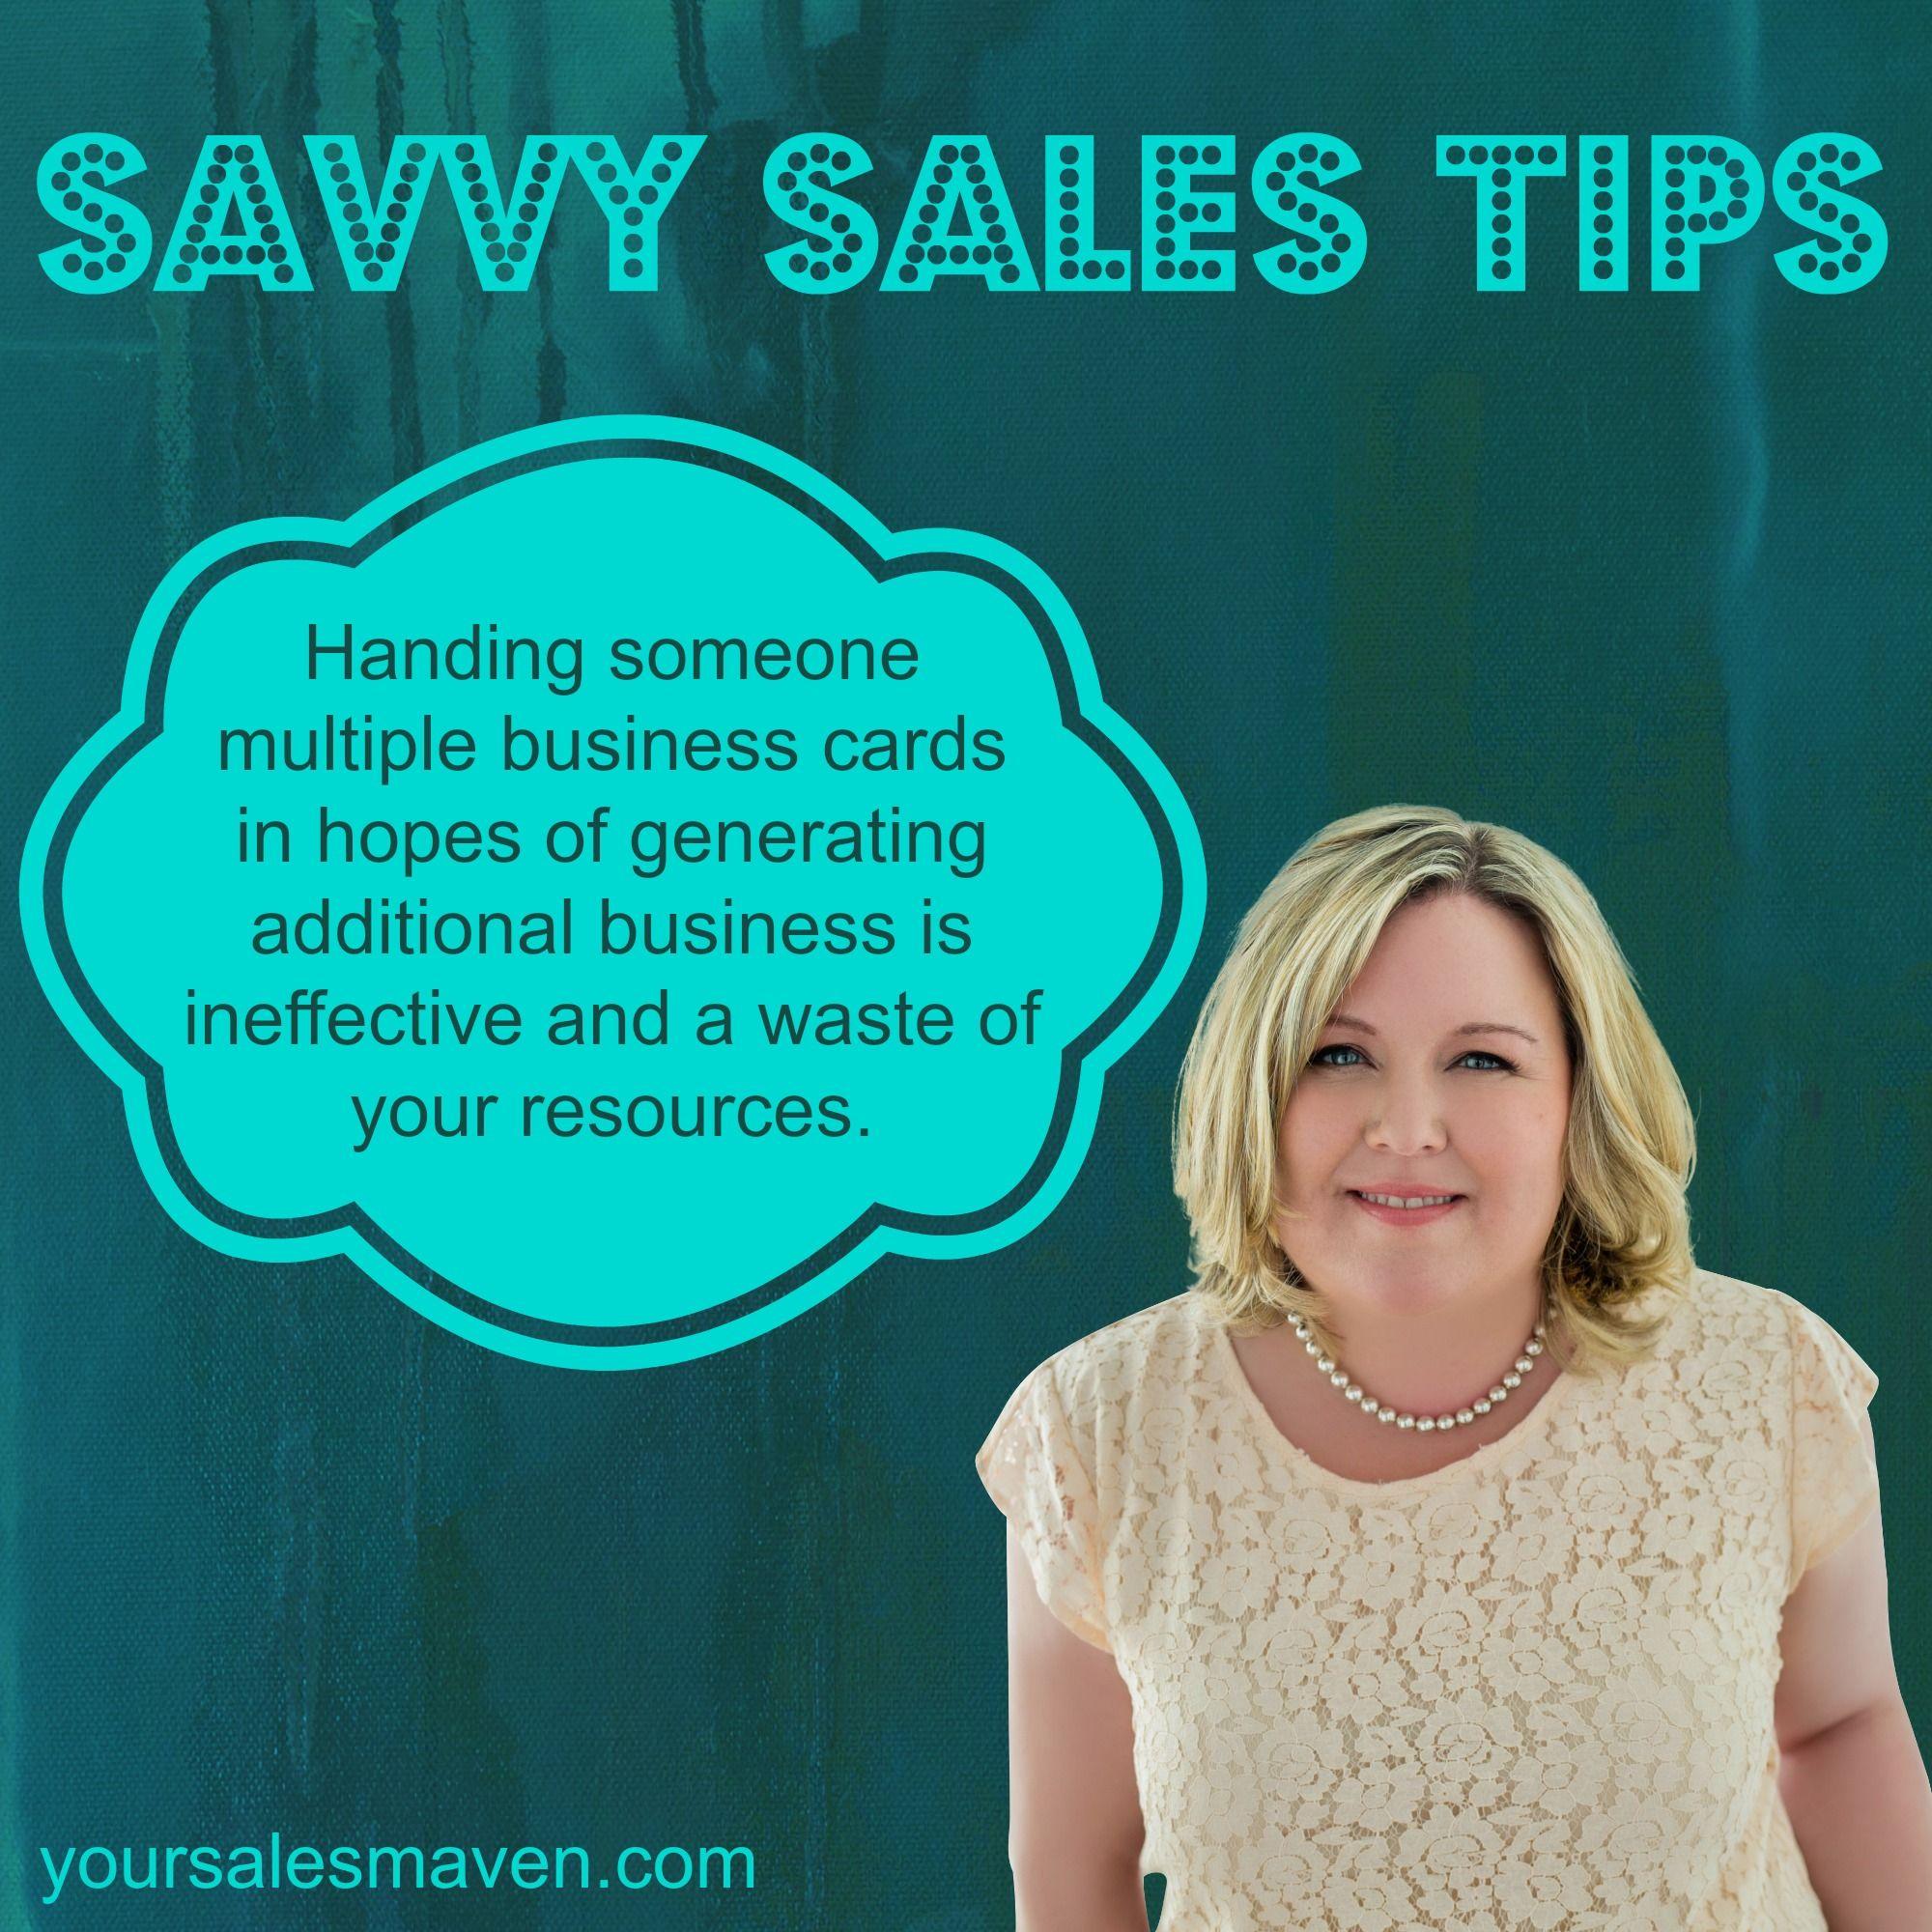 Business cards, rapport, sales tip